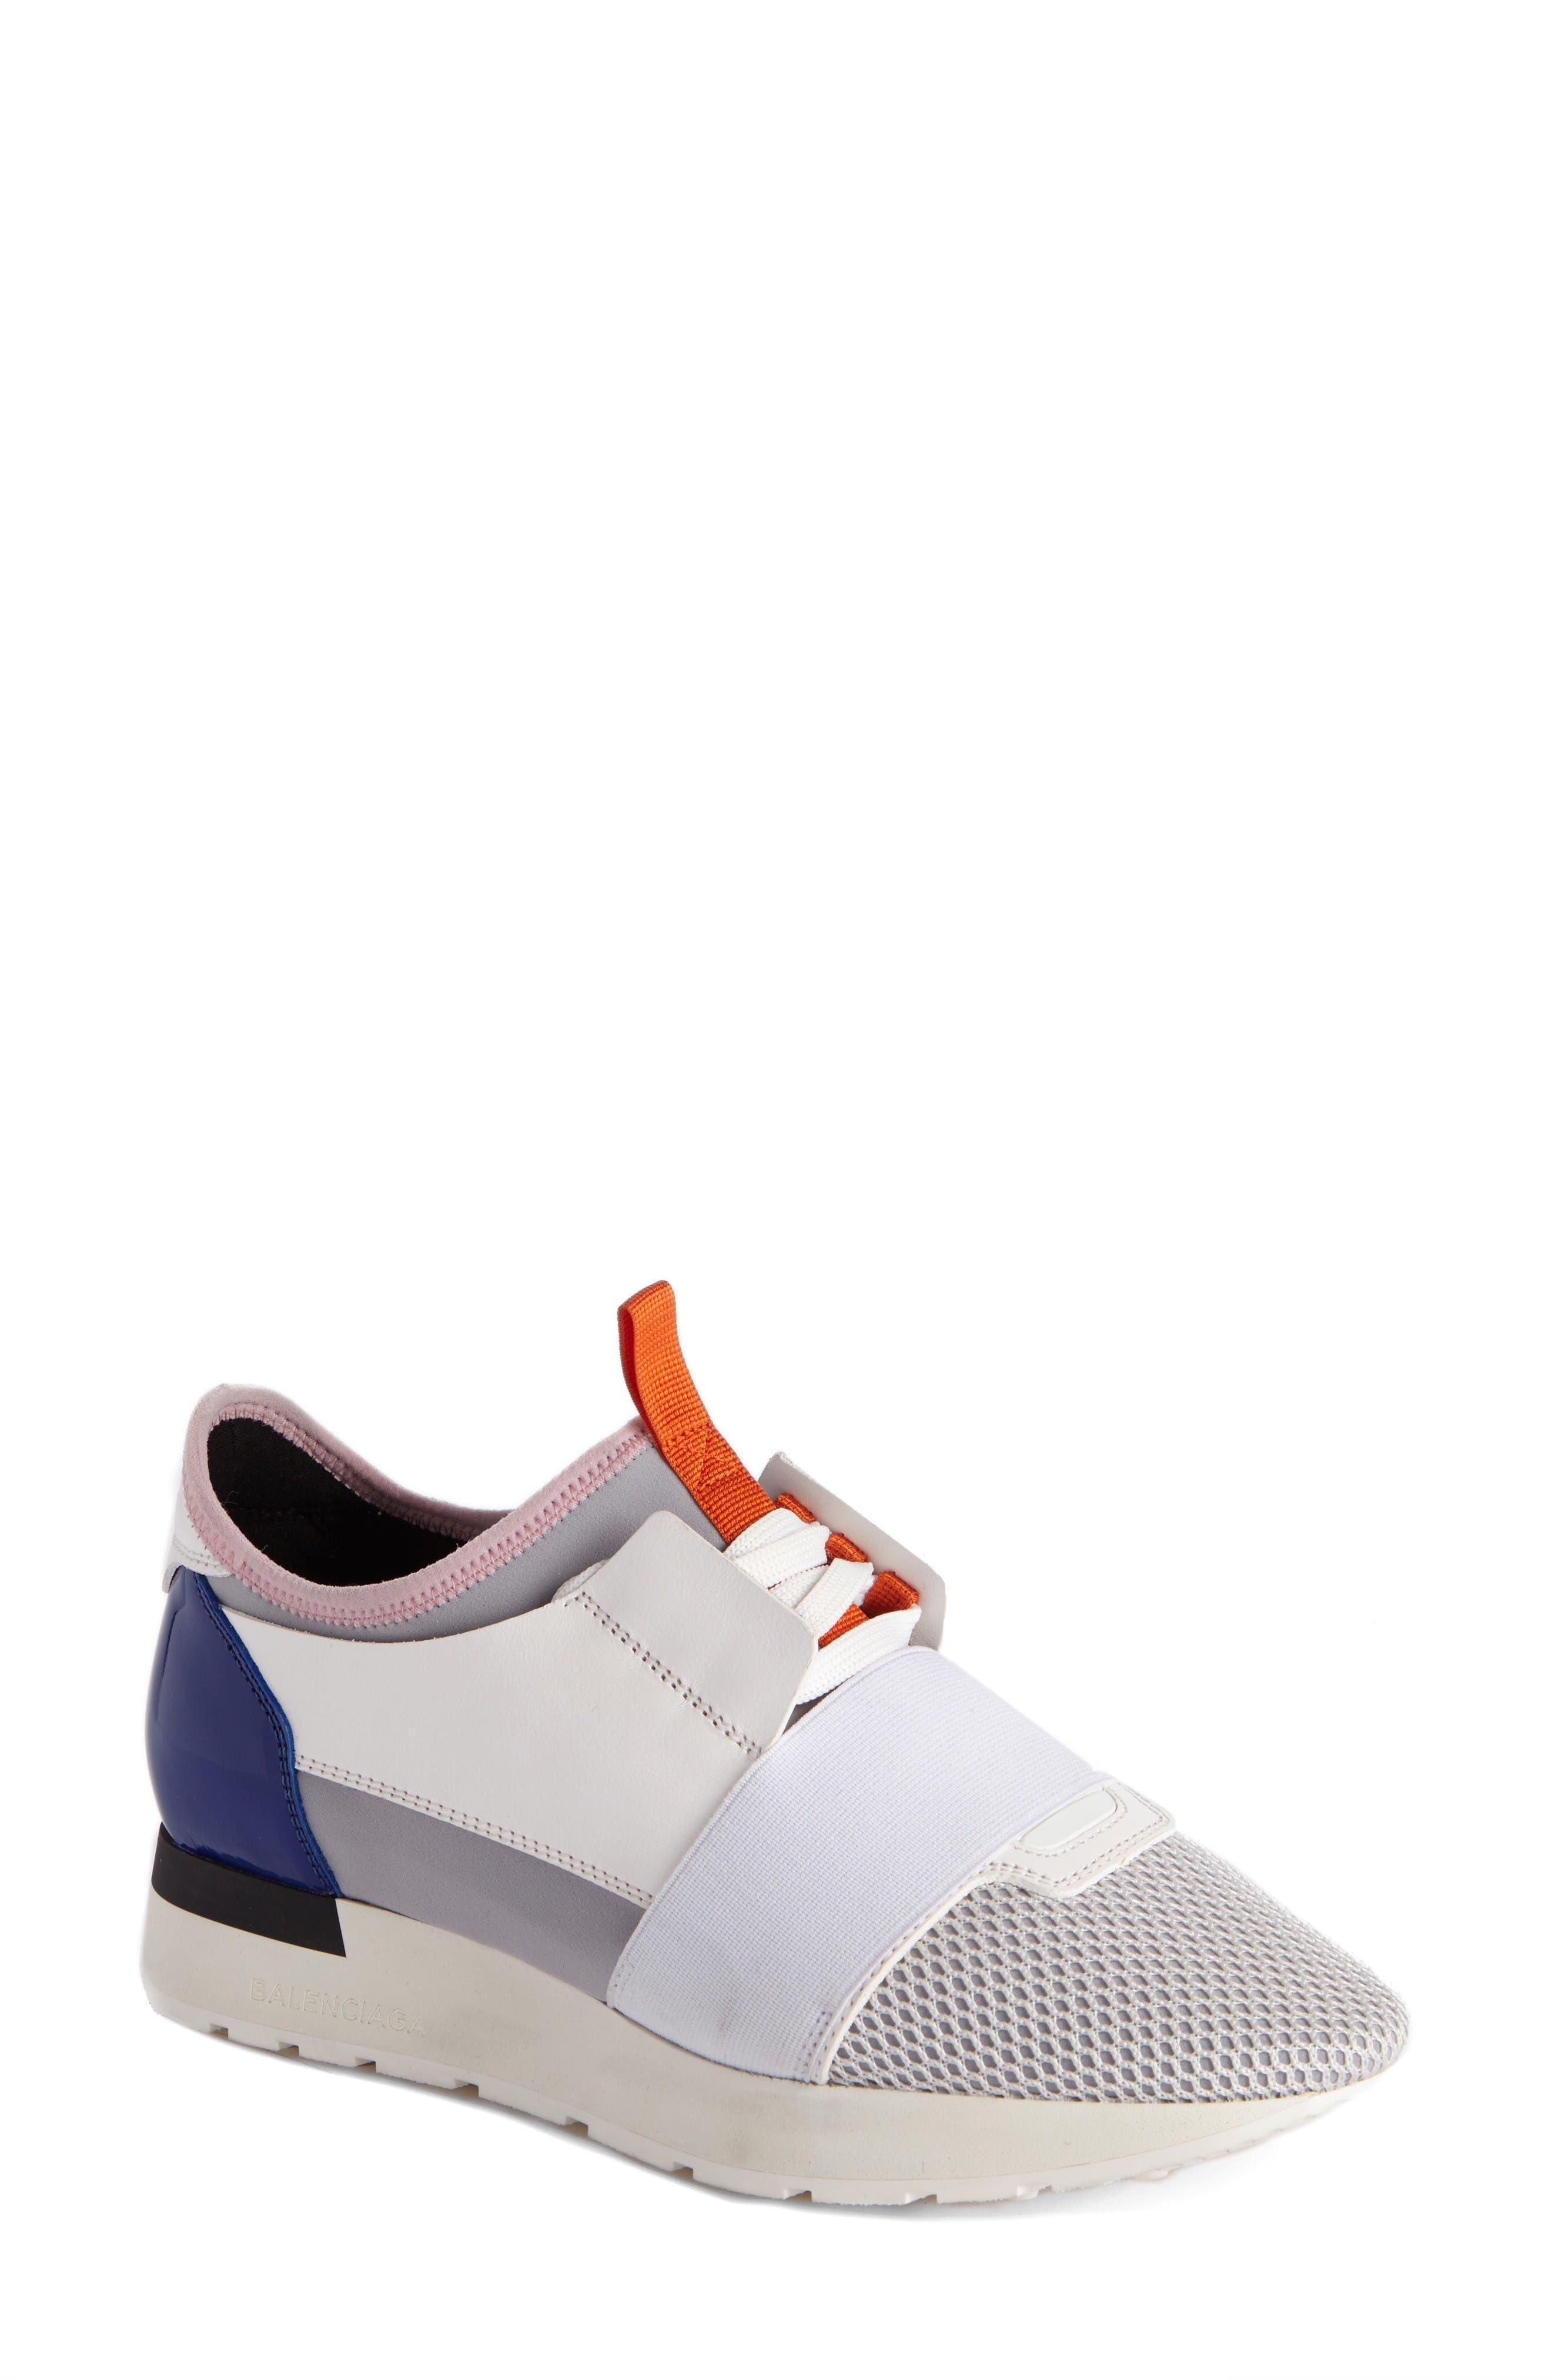 Alternate Image 1 Selected - Balenciaga Trainer Sneaker (Women)